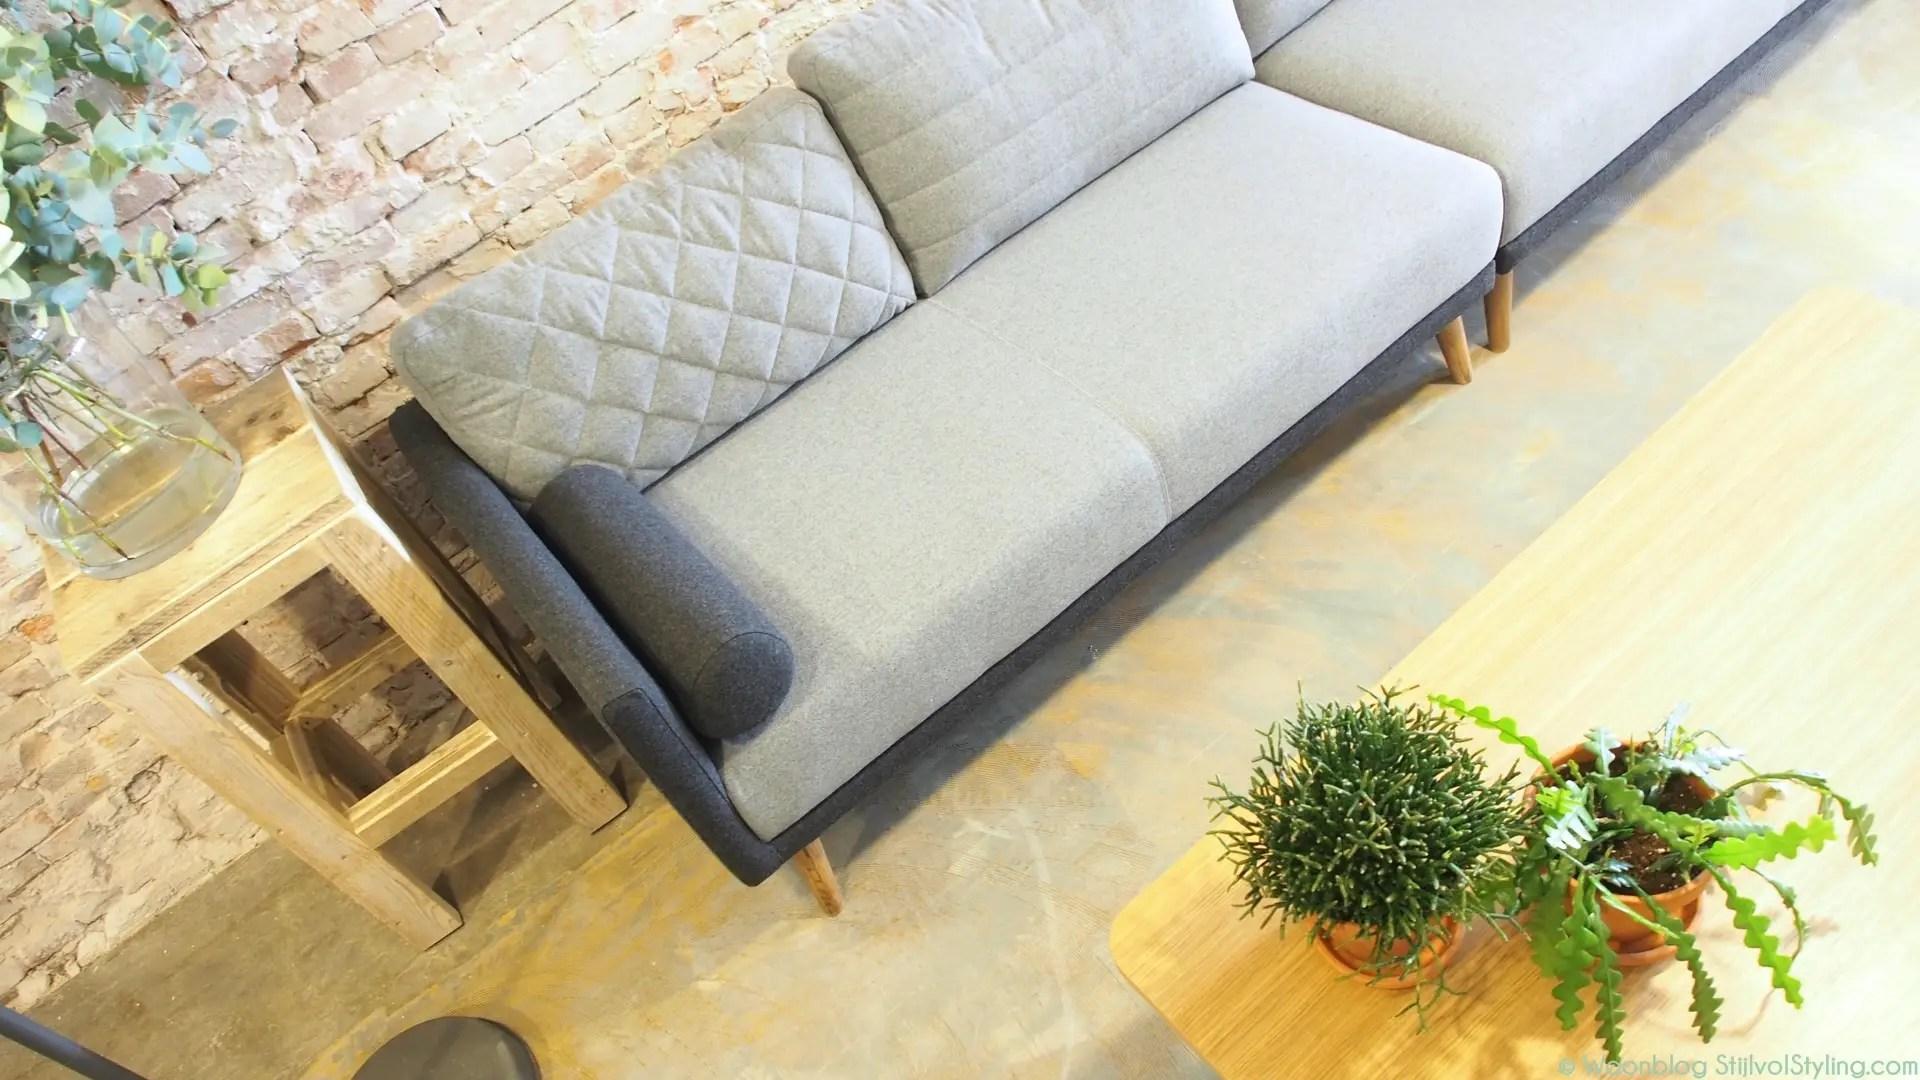 sofa company nl overstuffed covers interieur mood corner styling bij de sofacompany pop up store amsterdam